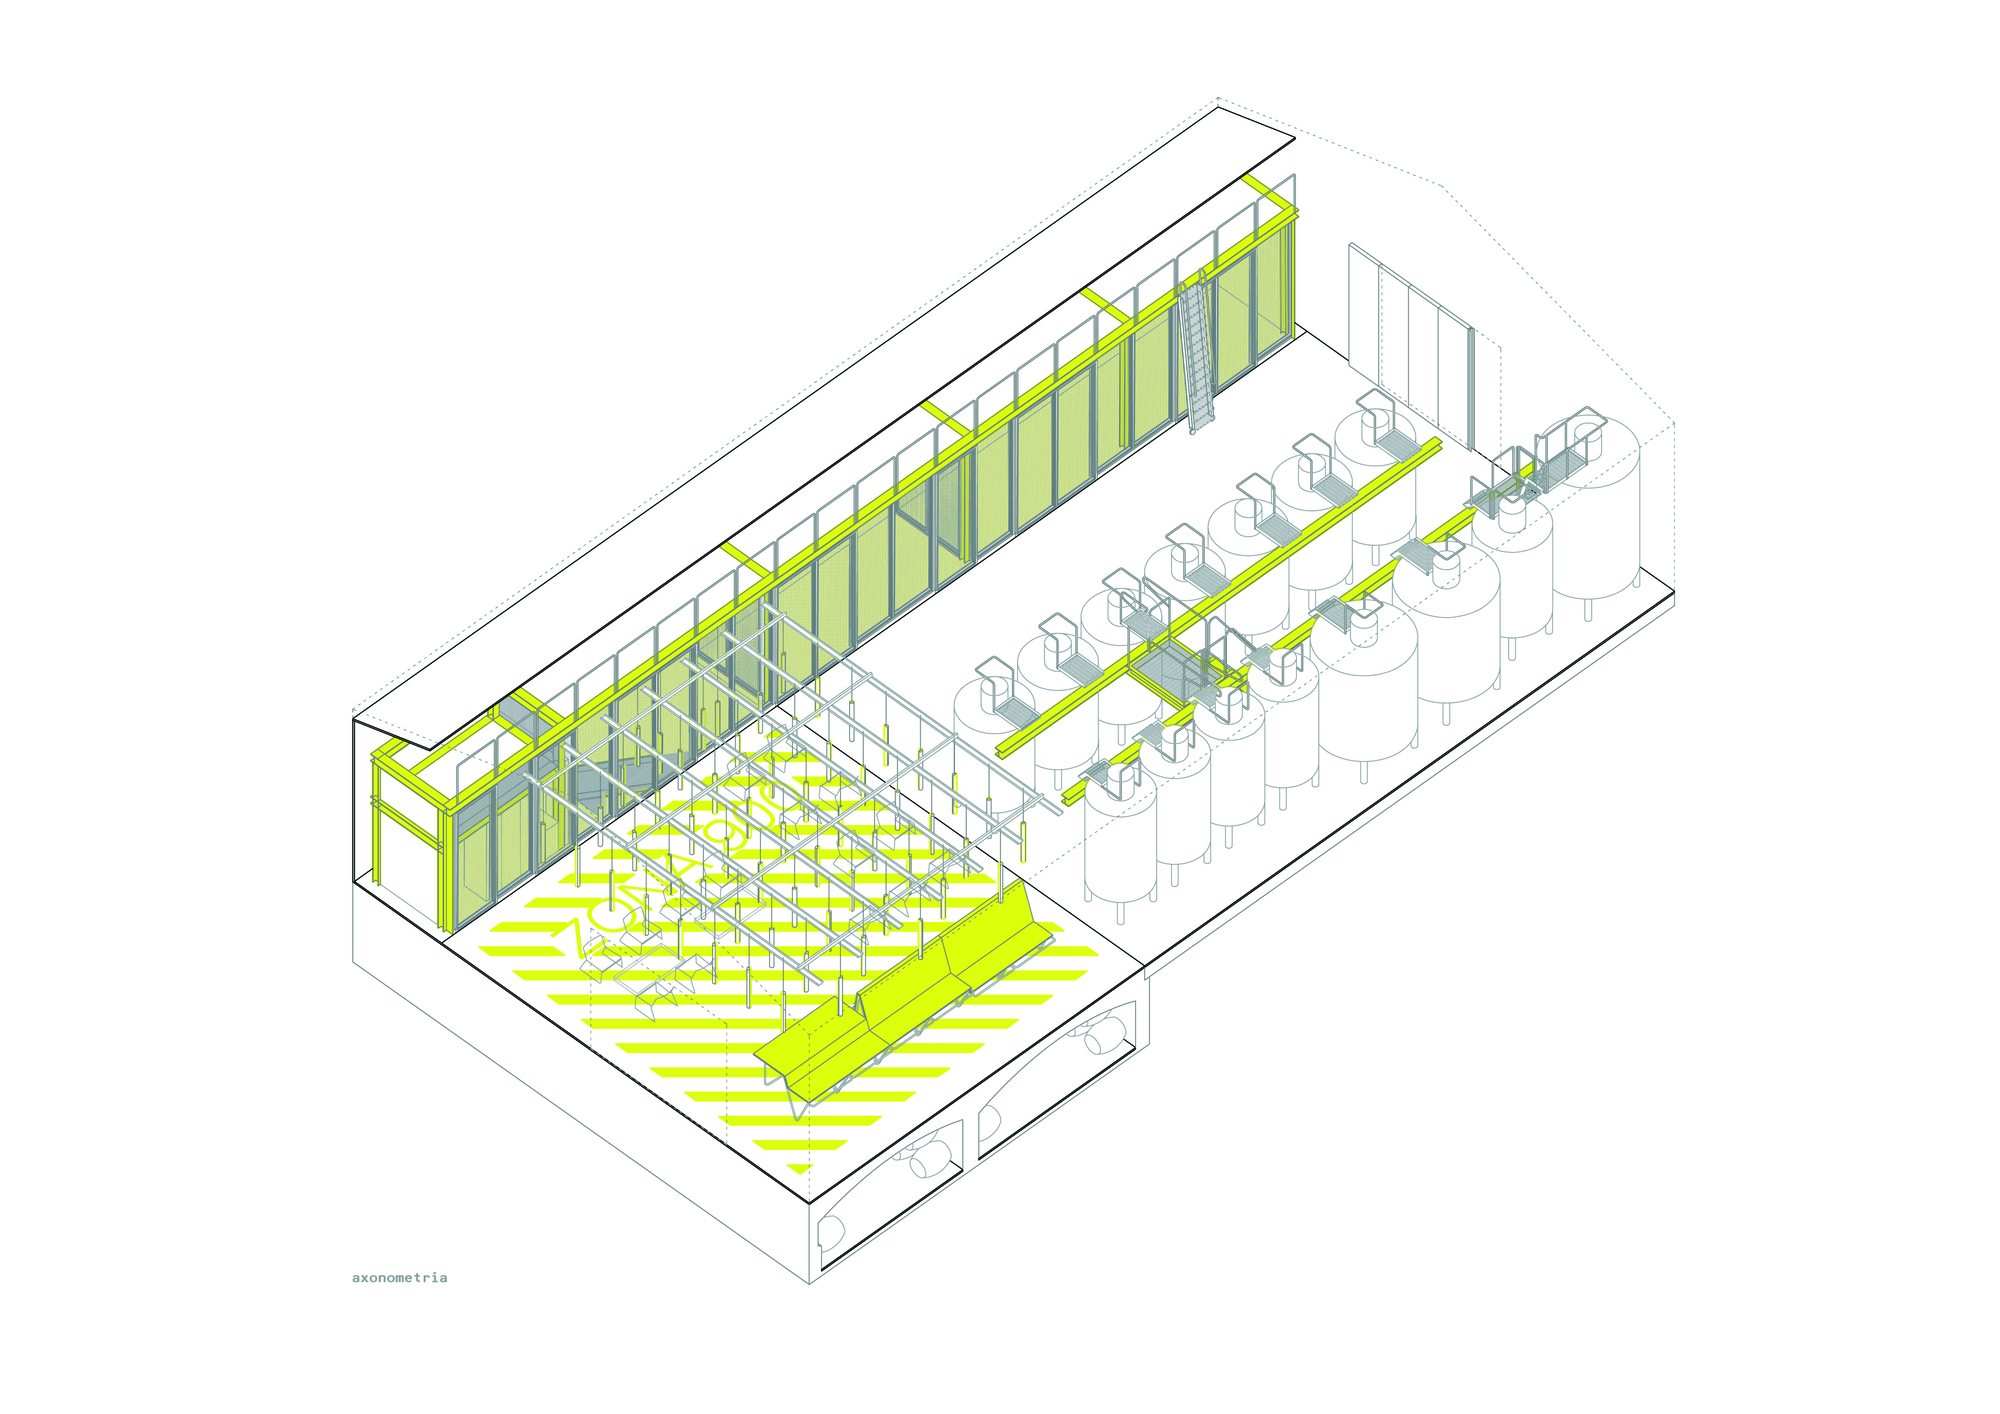 Lagravera / SALA FERUSIC Architects